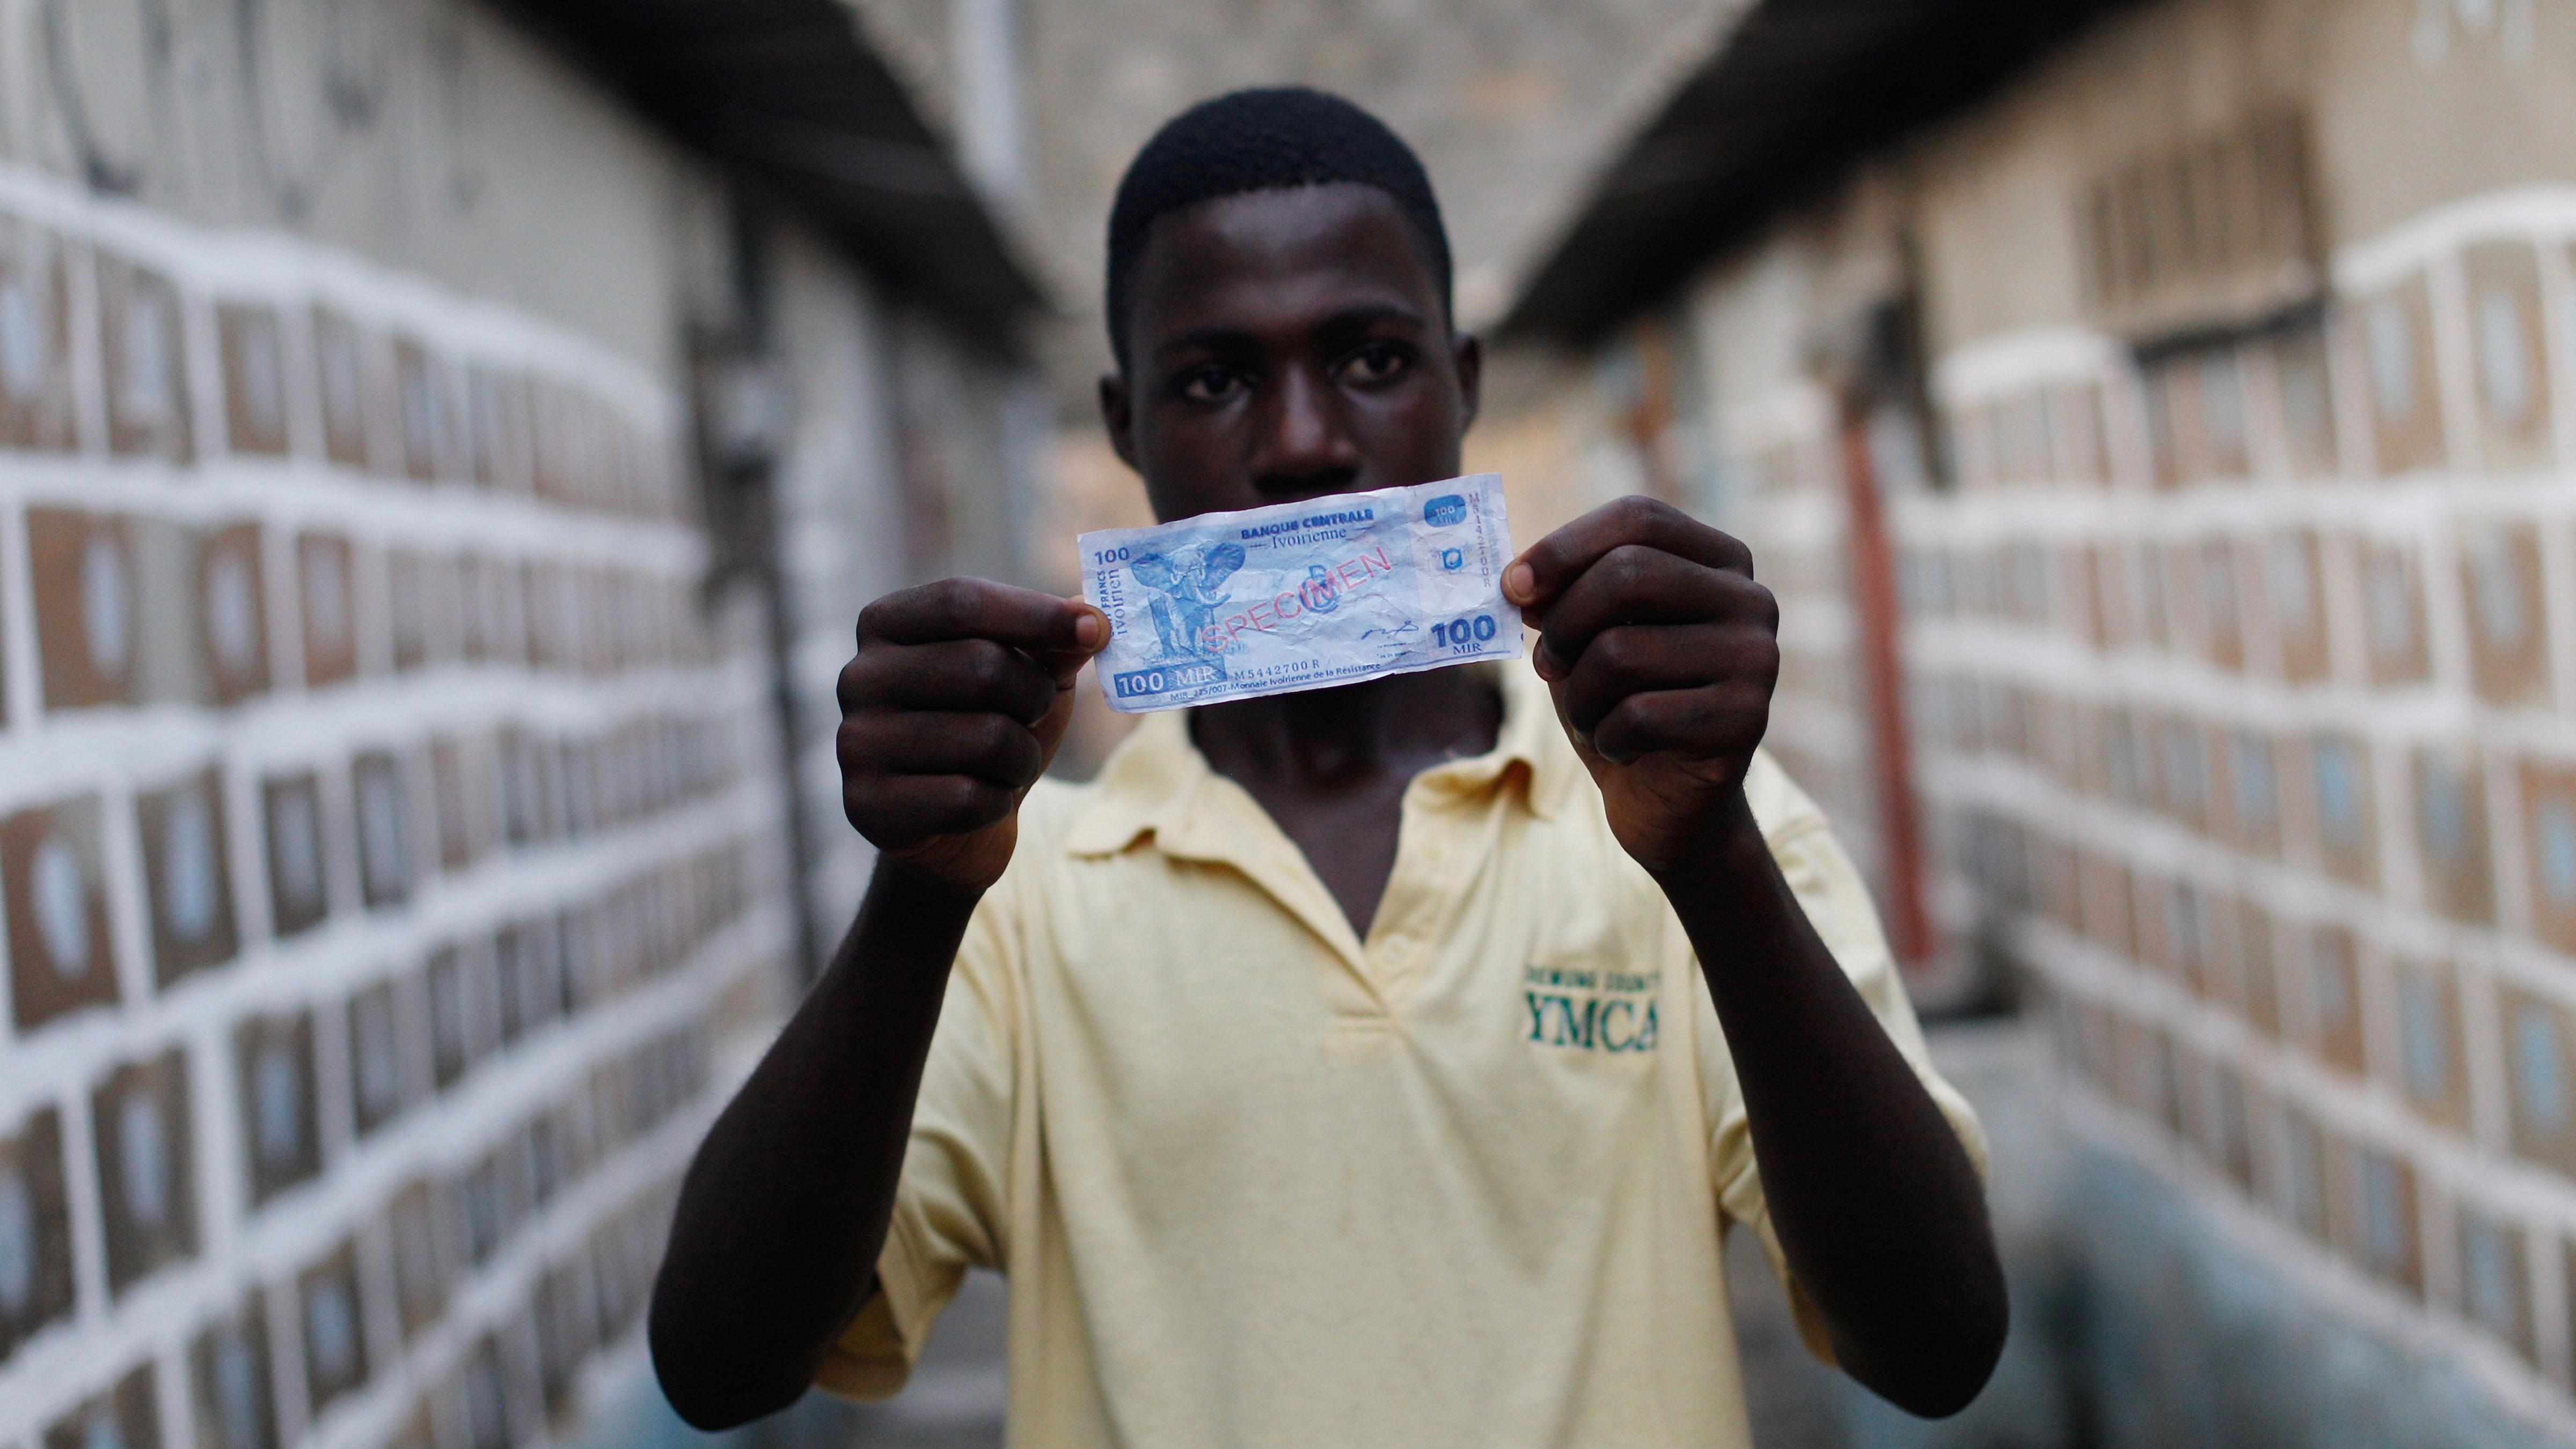 Senegal will begin circulating the eCFA, a digital currency back by West African regional bank